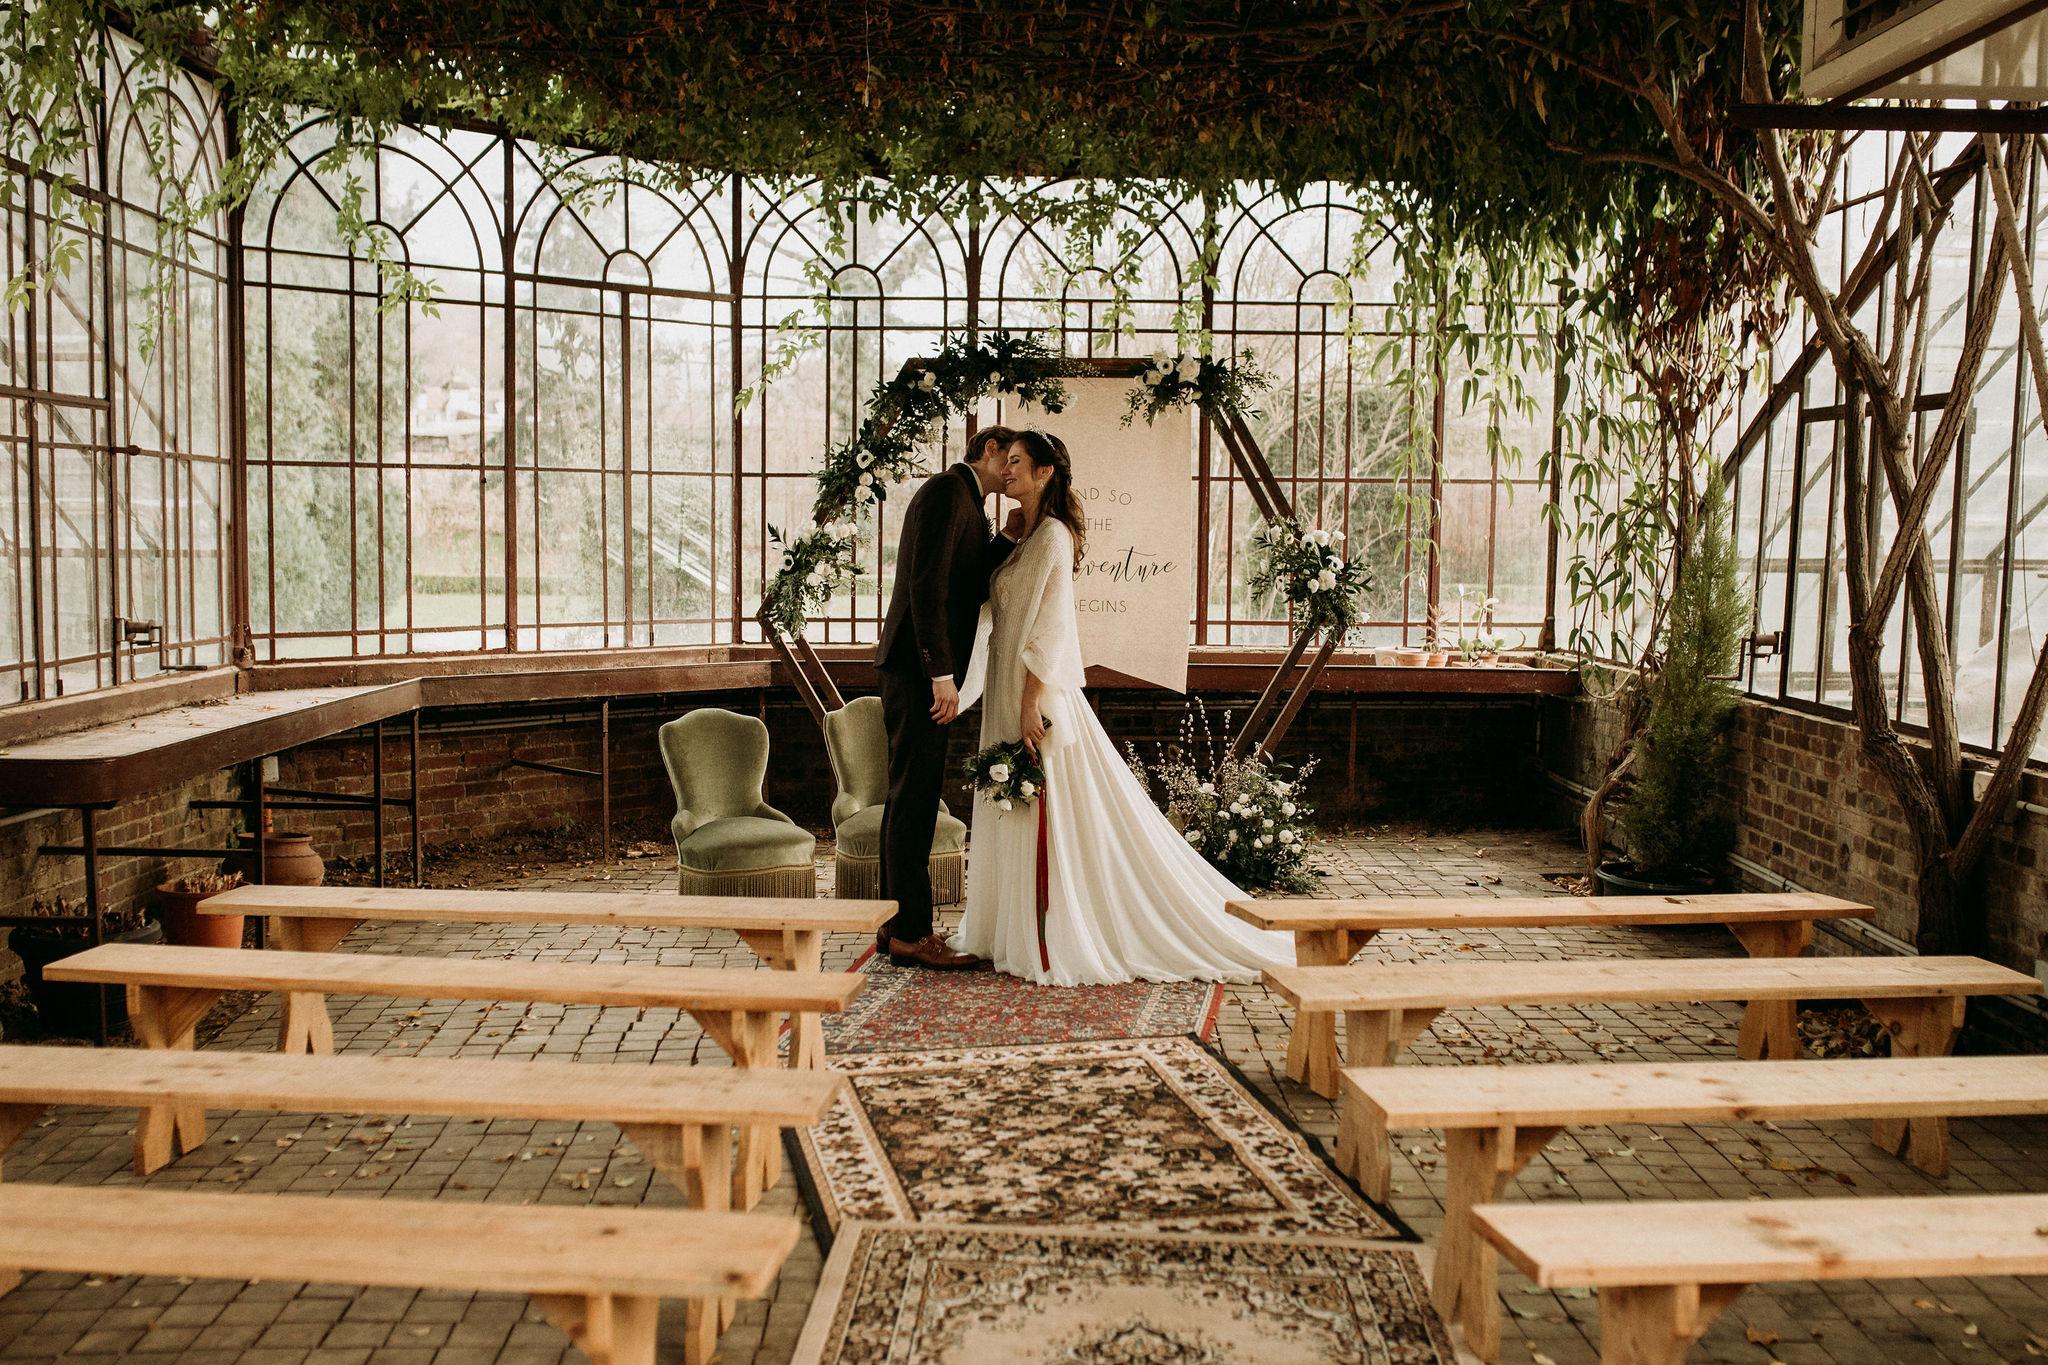 Domaine verderonne mariage